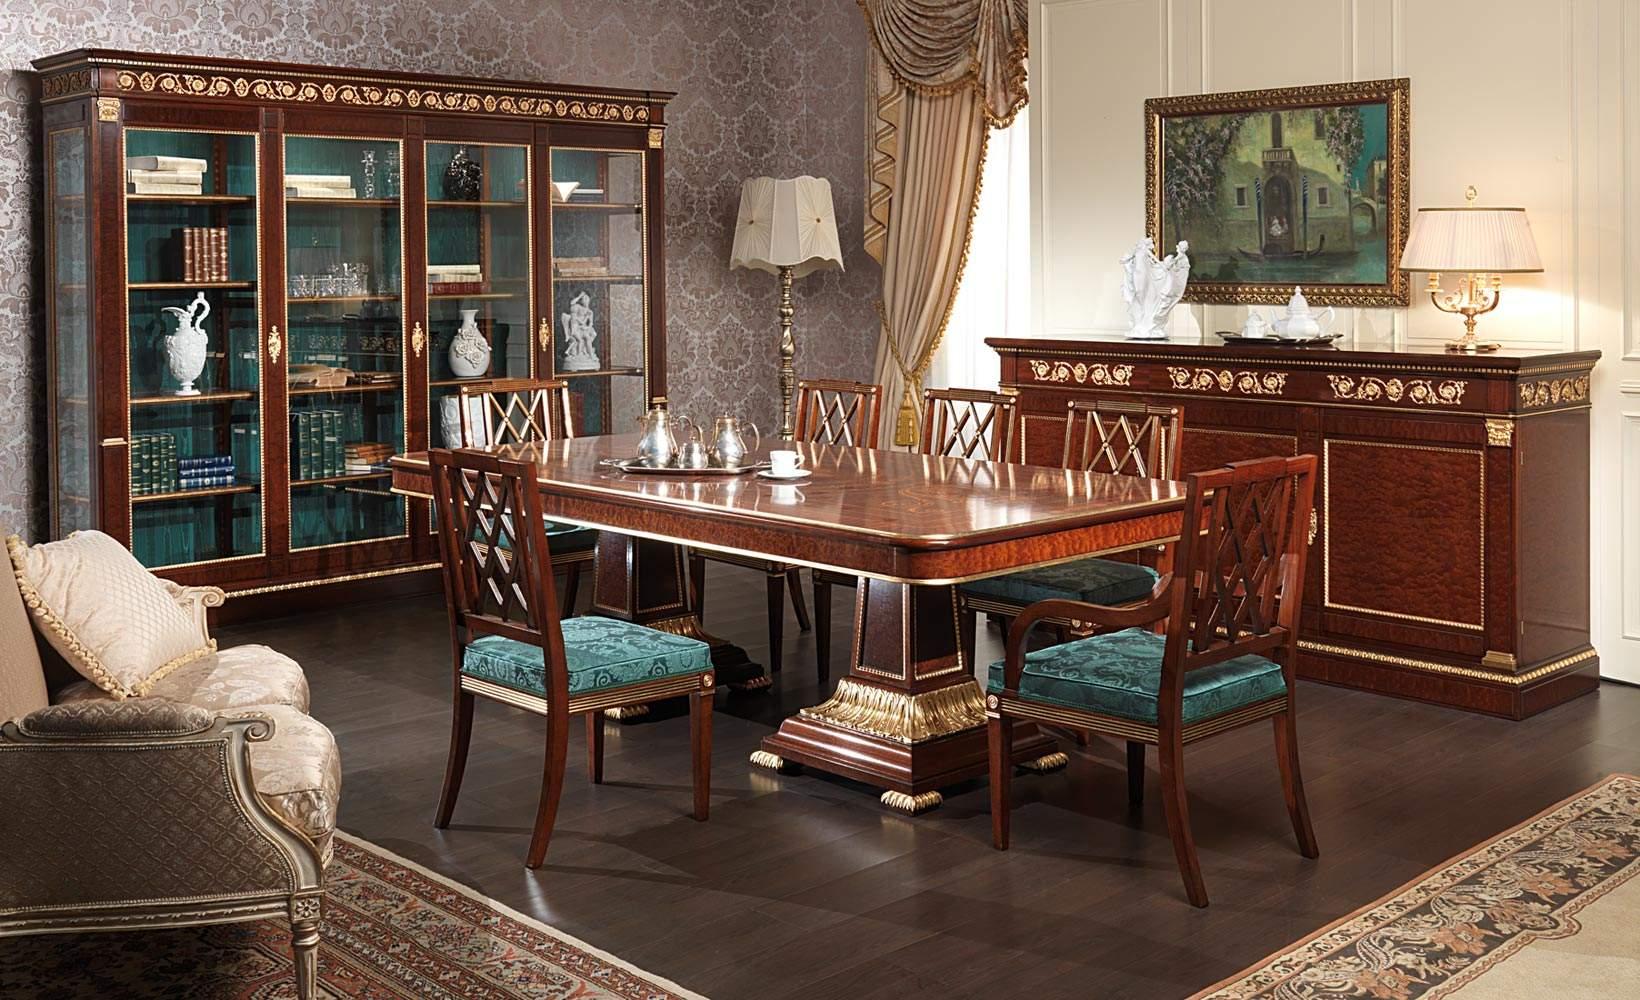 Sala da pranzo Ermitage stile impero | Vimercati Meda